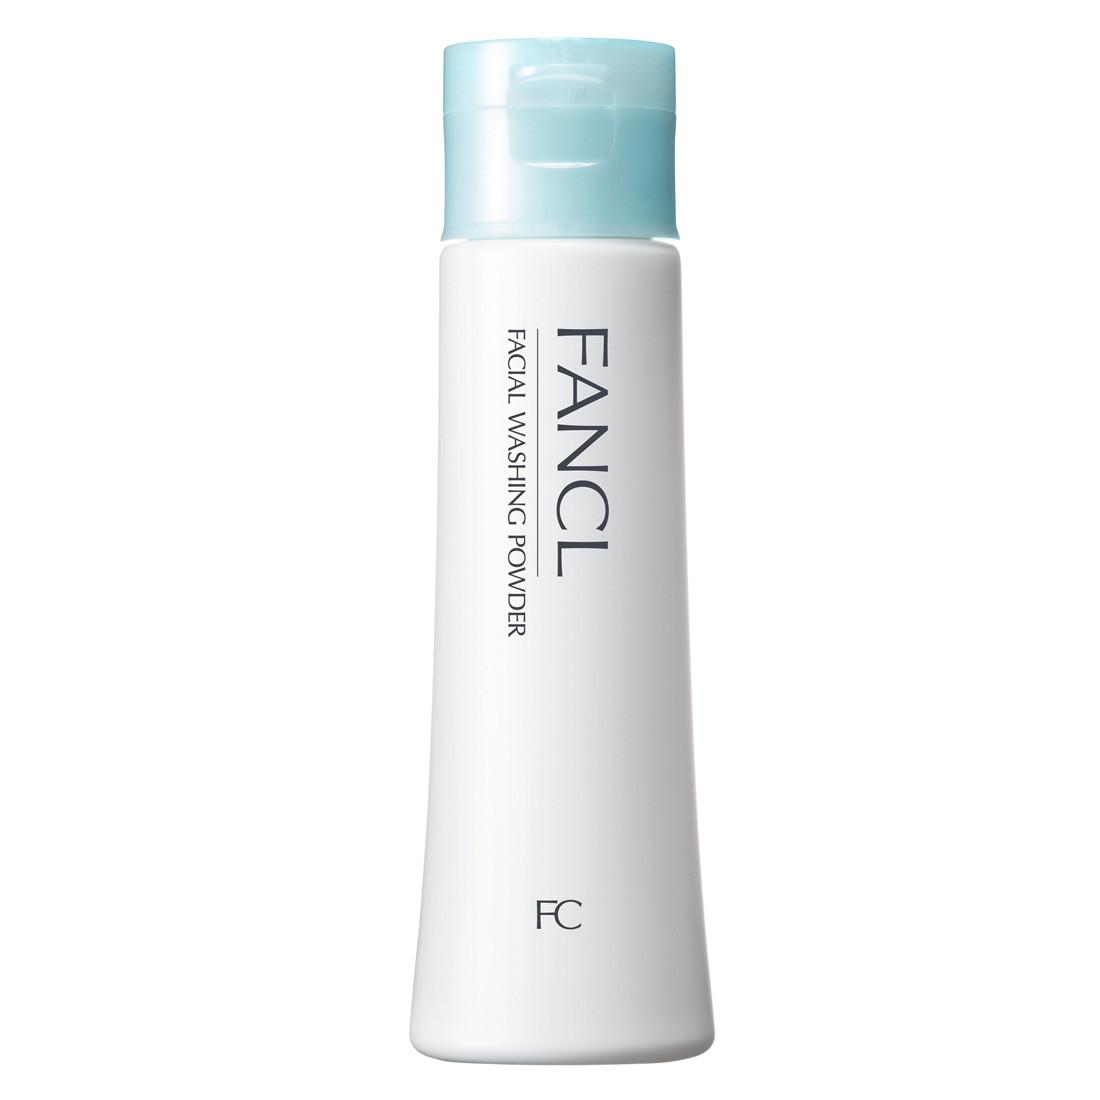 FANCL Washing Powder Пудра для умывания и очищения лица, 50 г